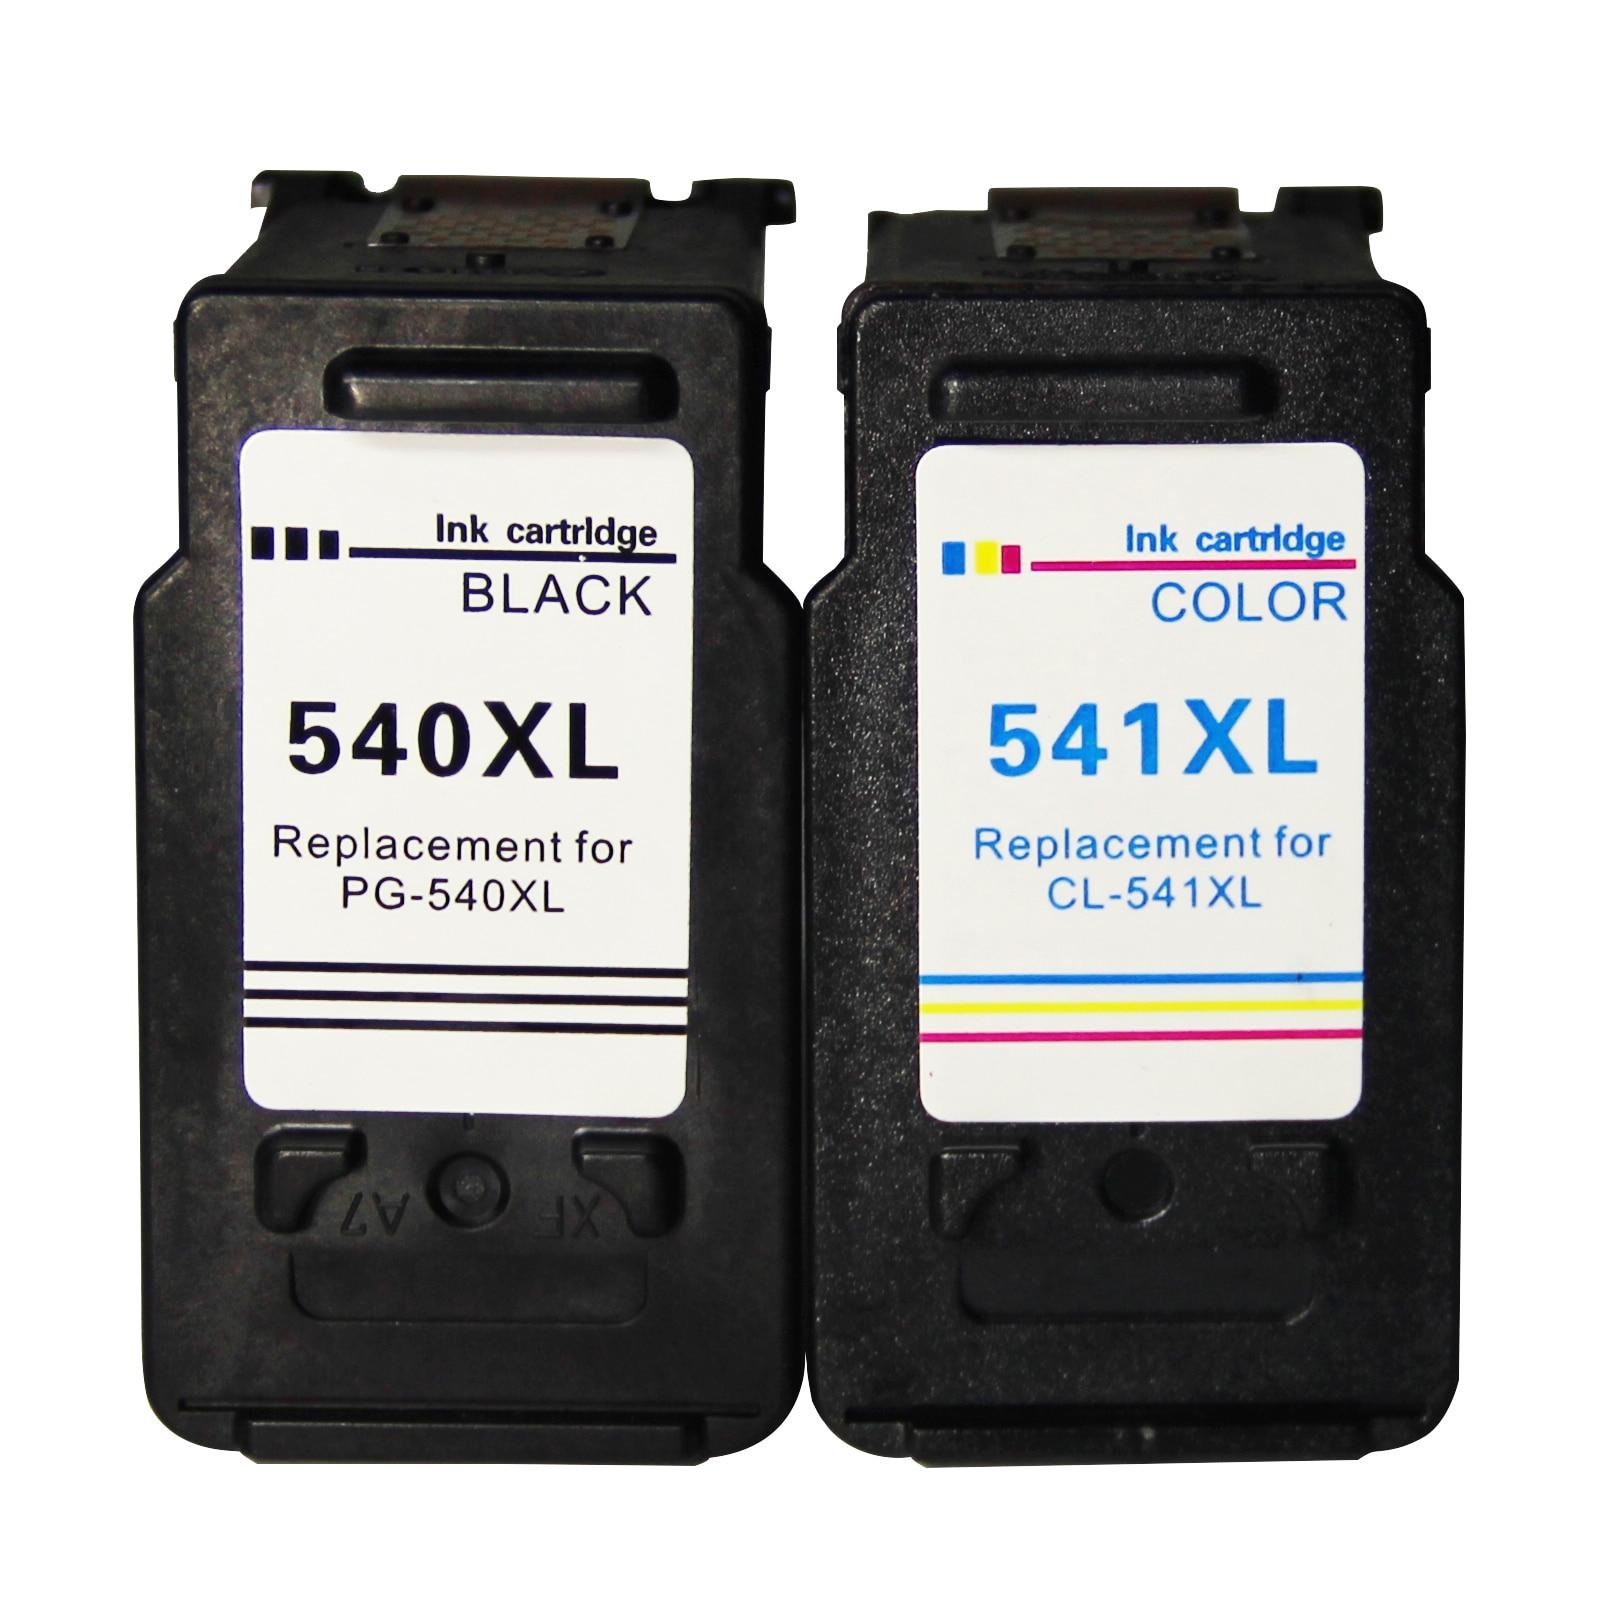 540XL 541XL pg540 cl541 compatibles para Canon PG 540 CL cartucho 541 Pixma MG3150 MG3550 MG4250 MG3250 MG3255 MG4150 impresora